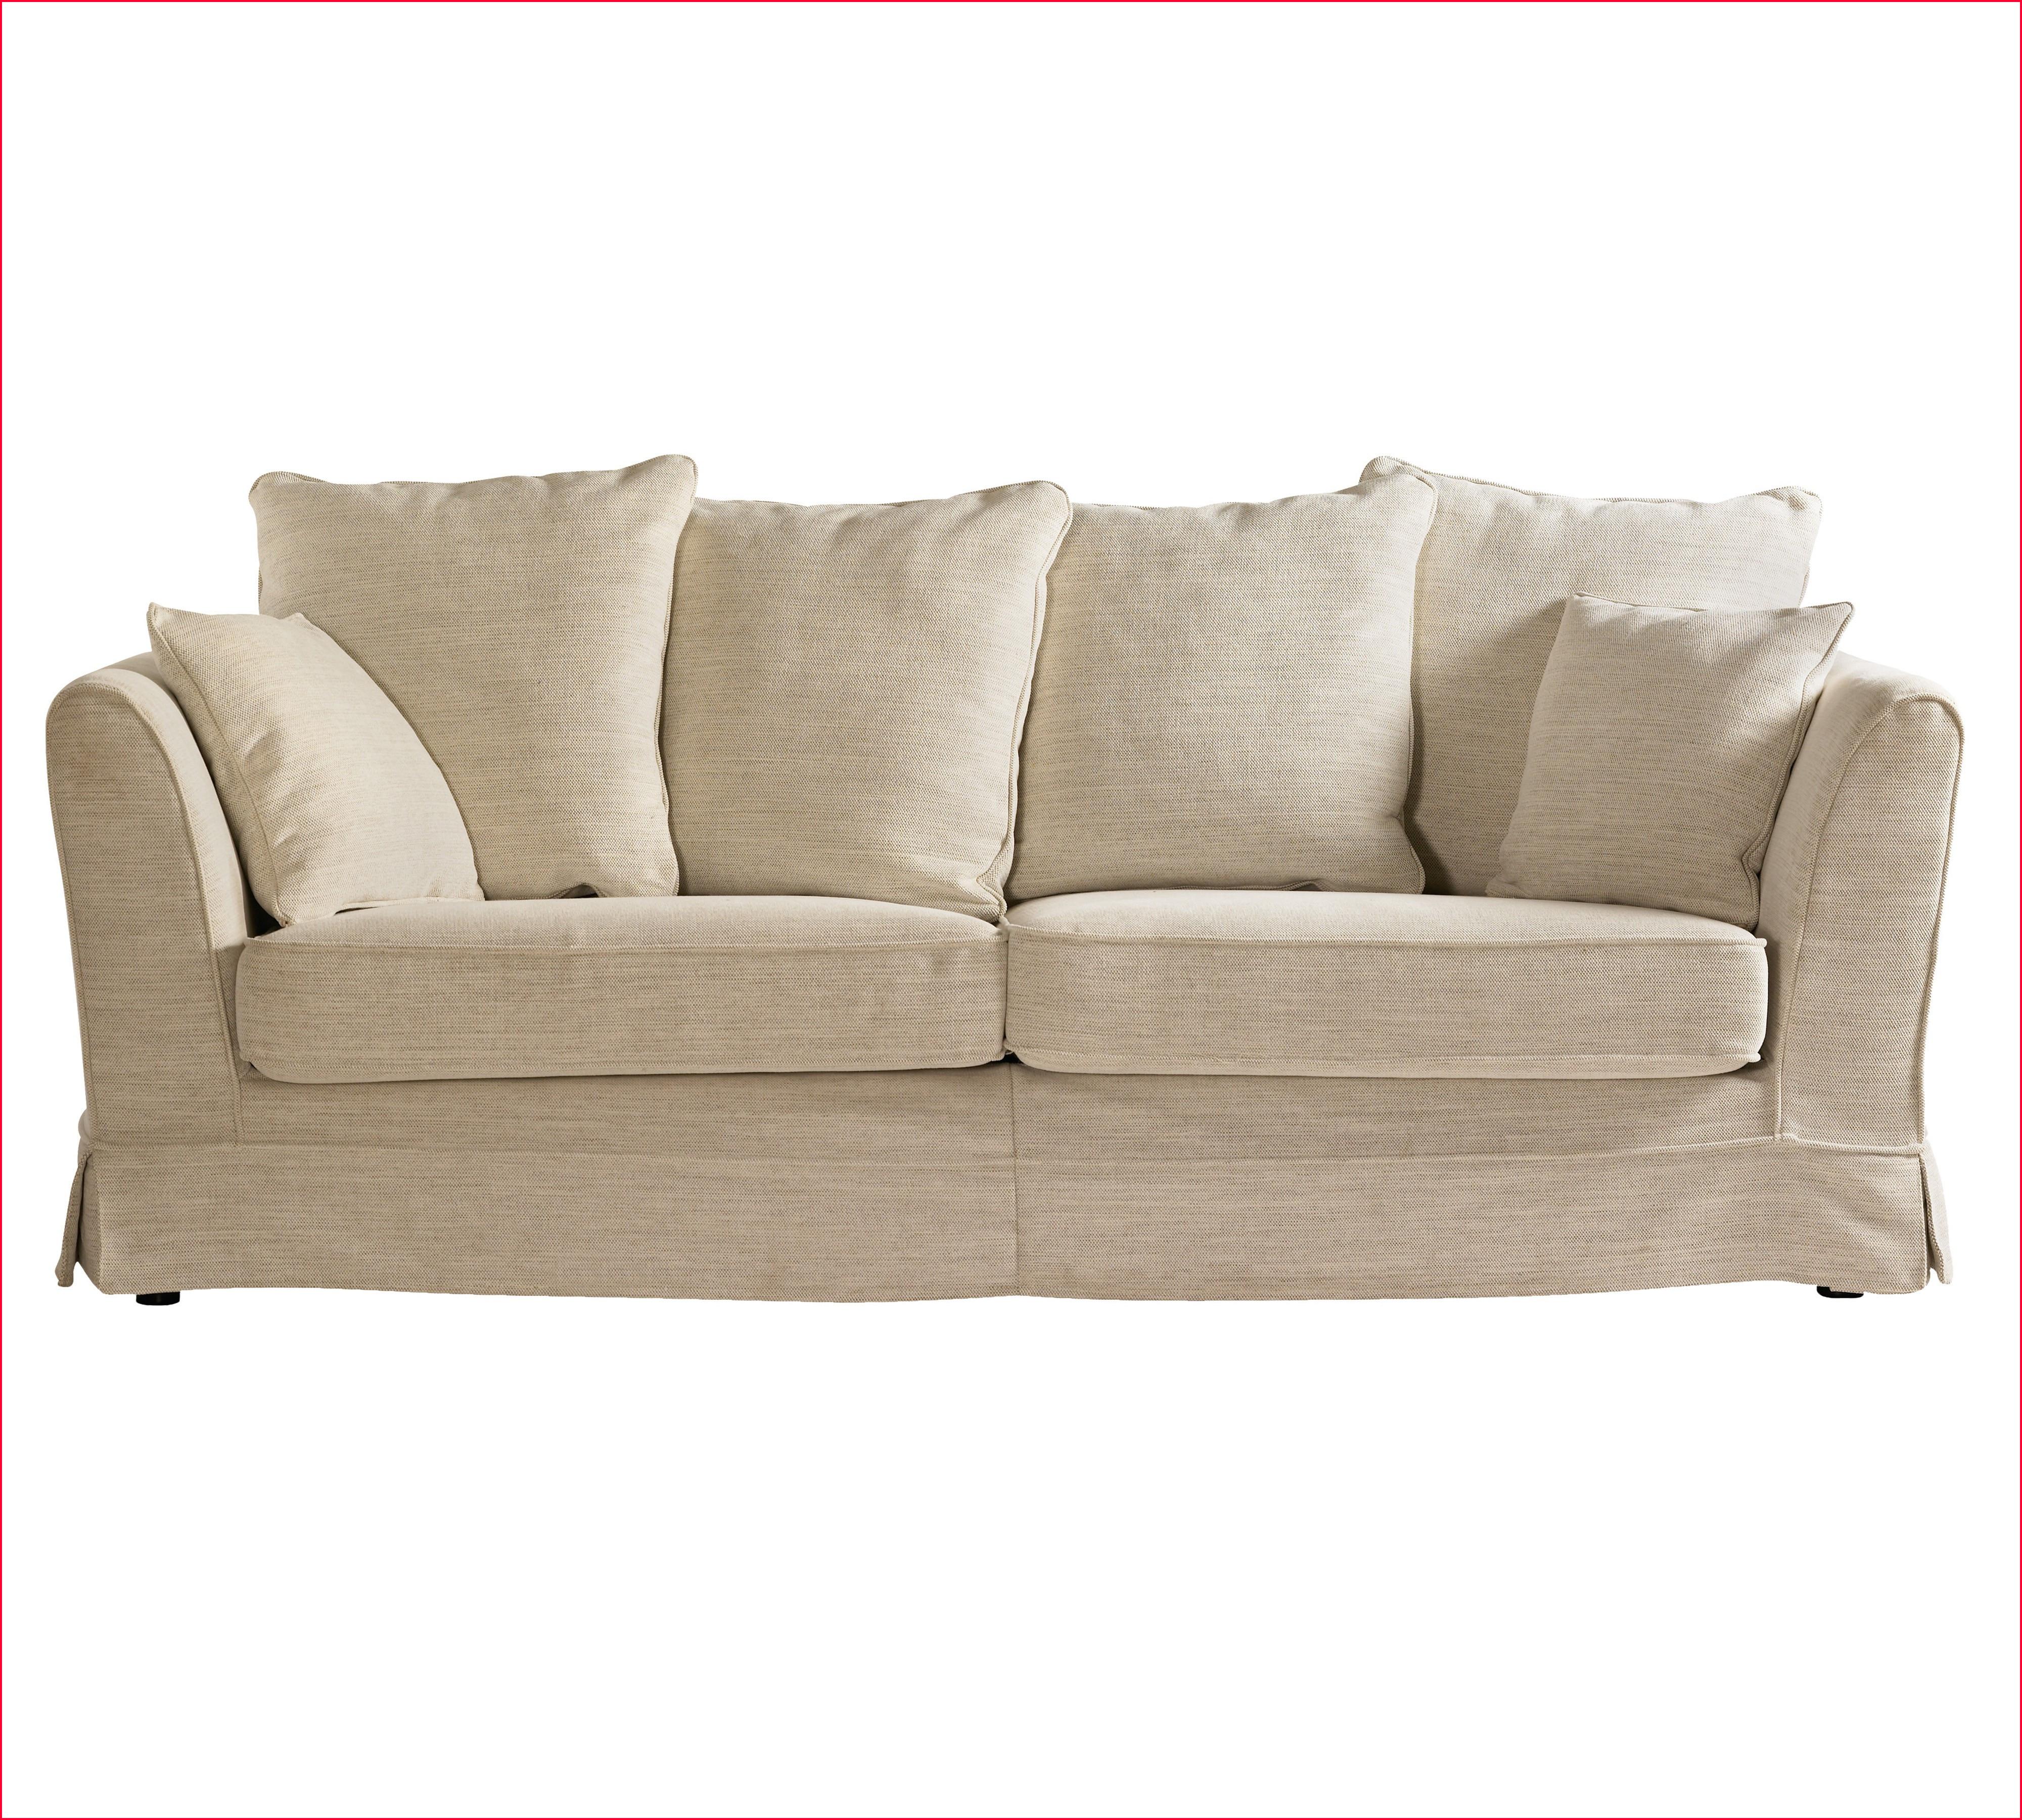 sofa cama madrid sofamex bruin blog On sofas baratos madrid outlet